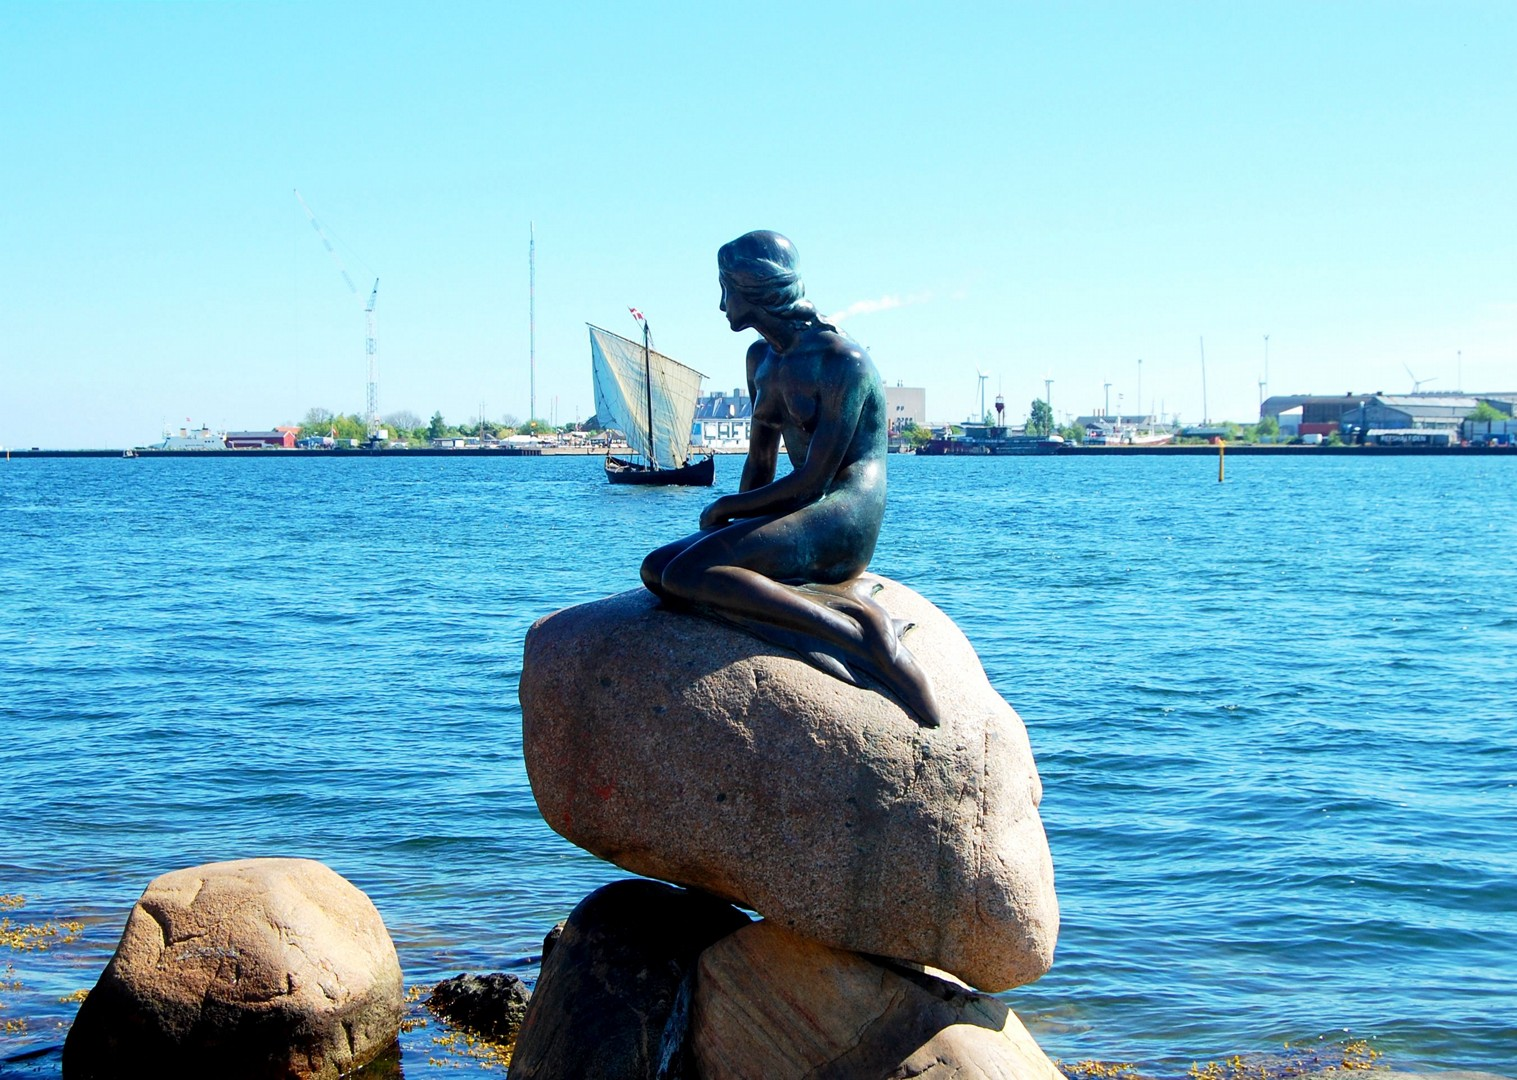 little-mermaid-statue-copenhagen-denmark-leisure-biking.jpg - Denmark - Coast, Castles and Copenhagen - Self-Guided Leisure Cycling Holiday - Leisure Cycling